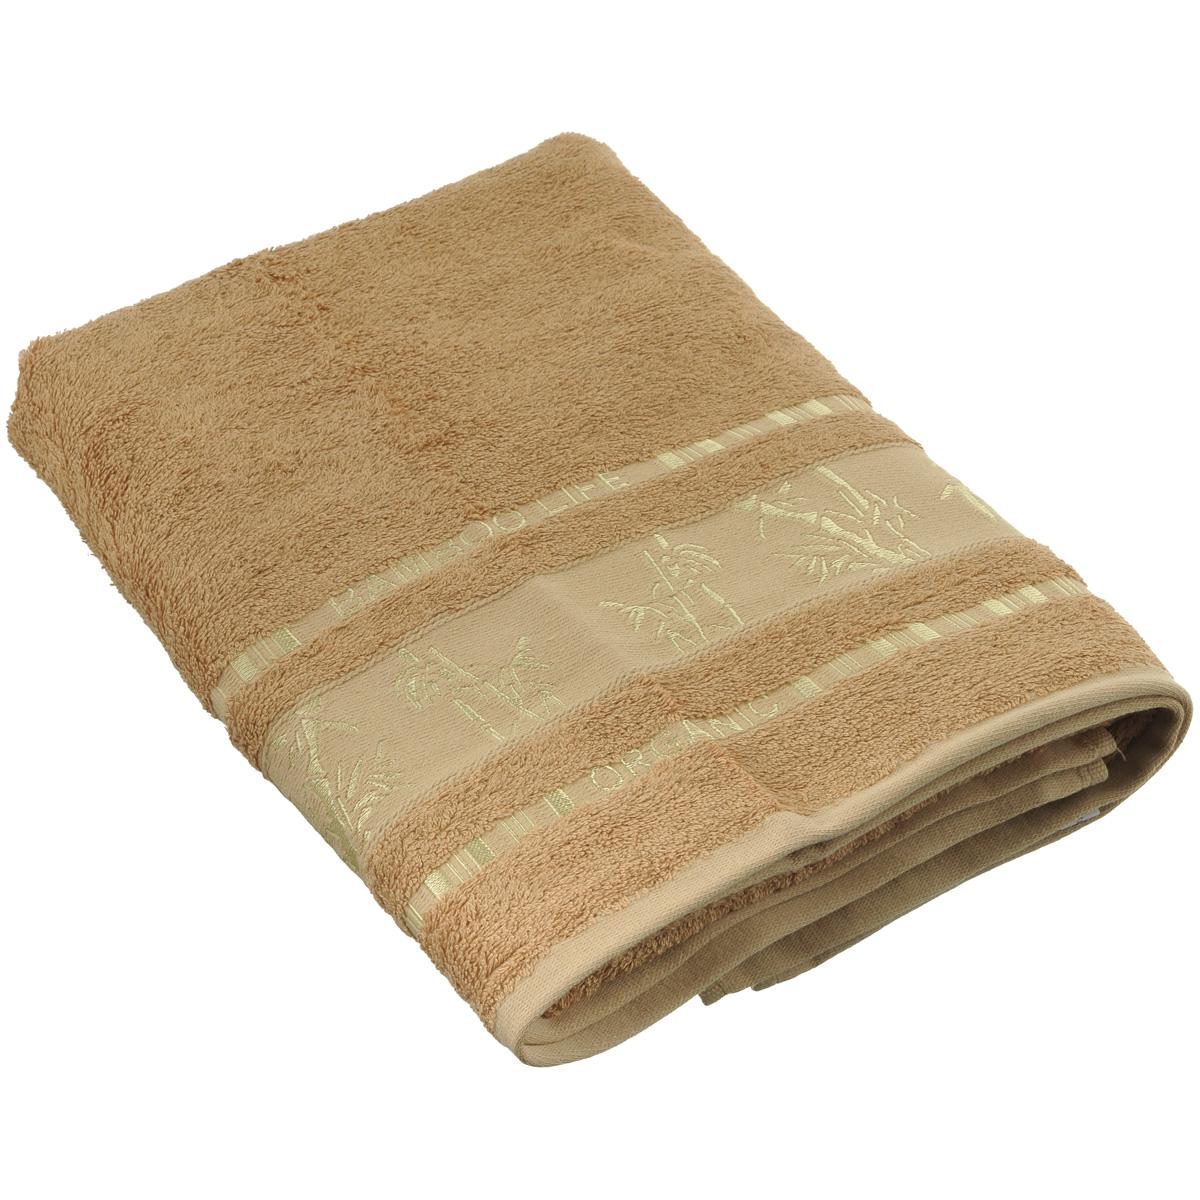 "��������� Mariposa ""Bamboo"", ����: ������-����������, 70 � 140 ��"